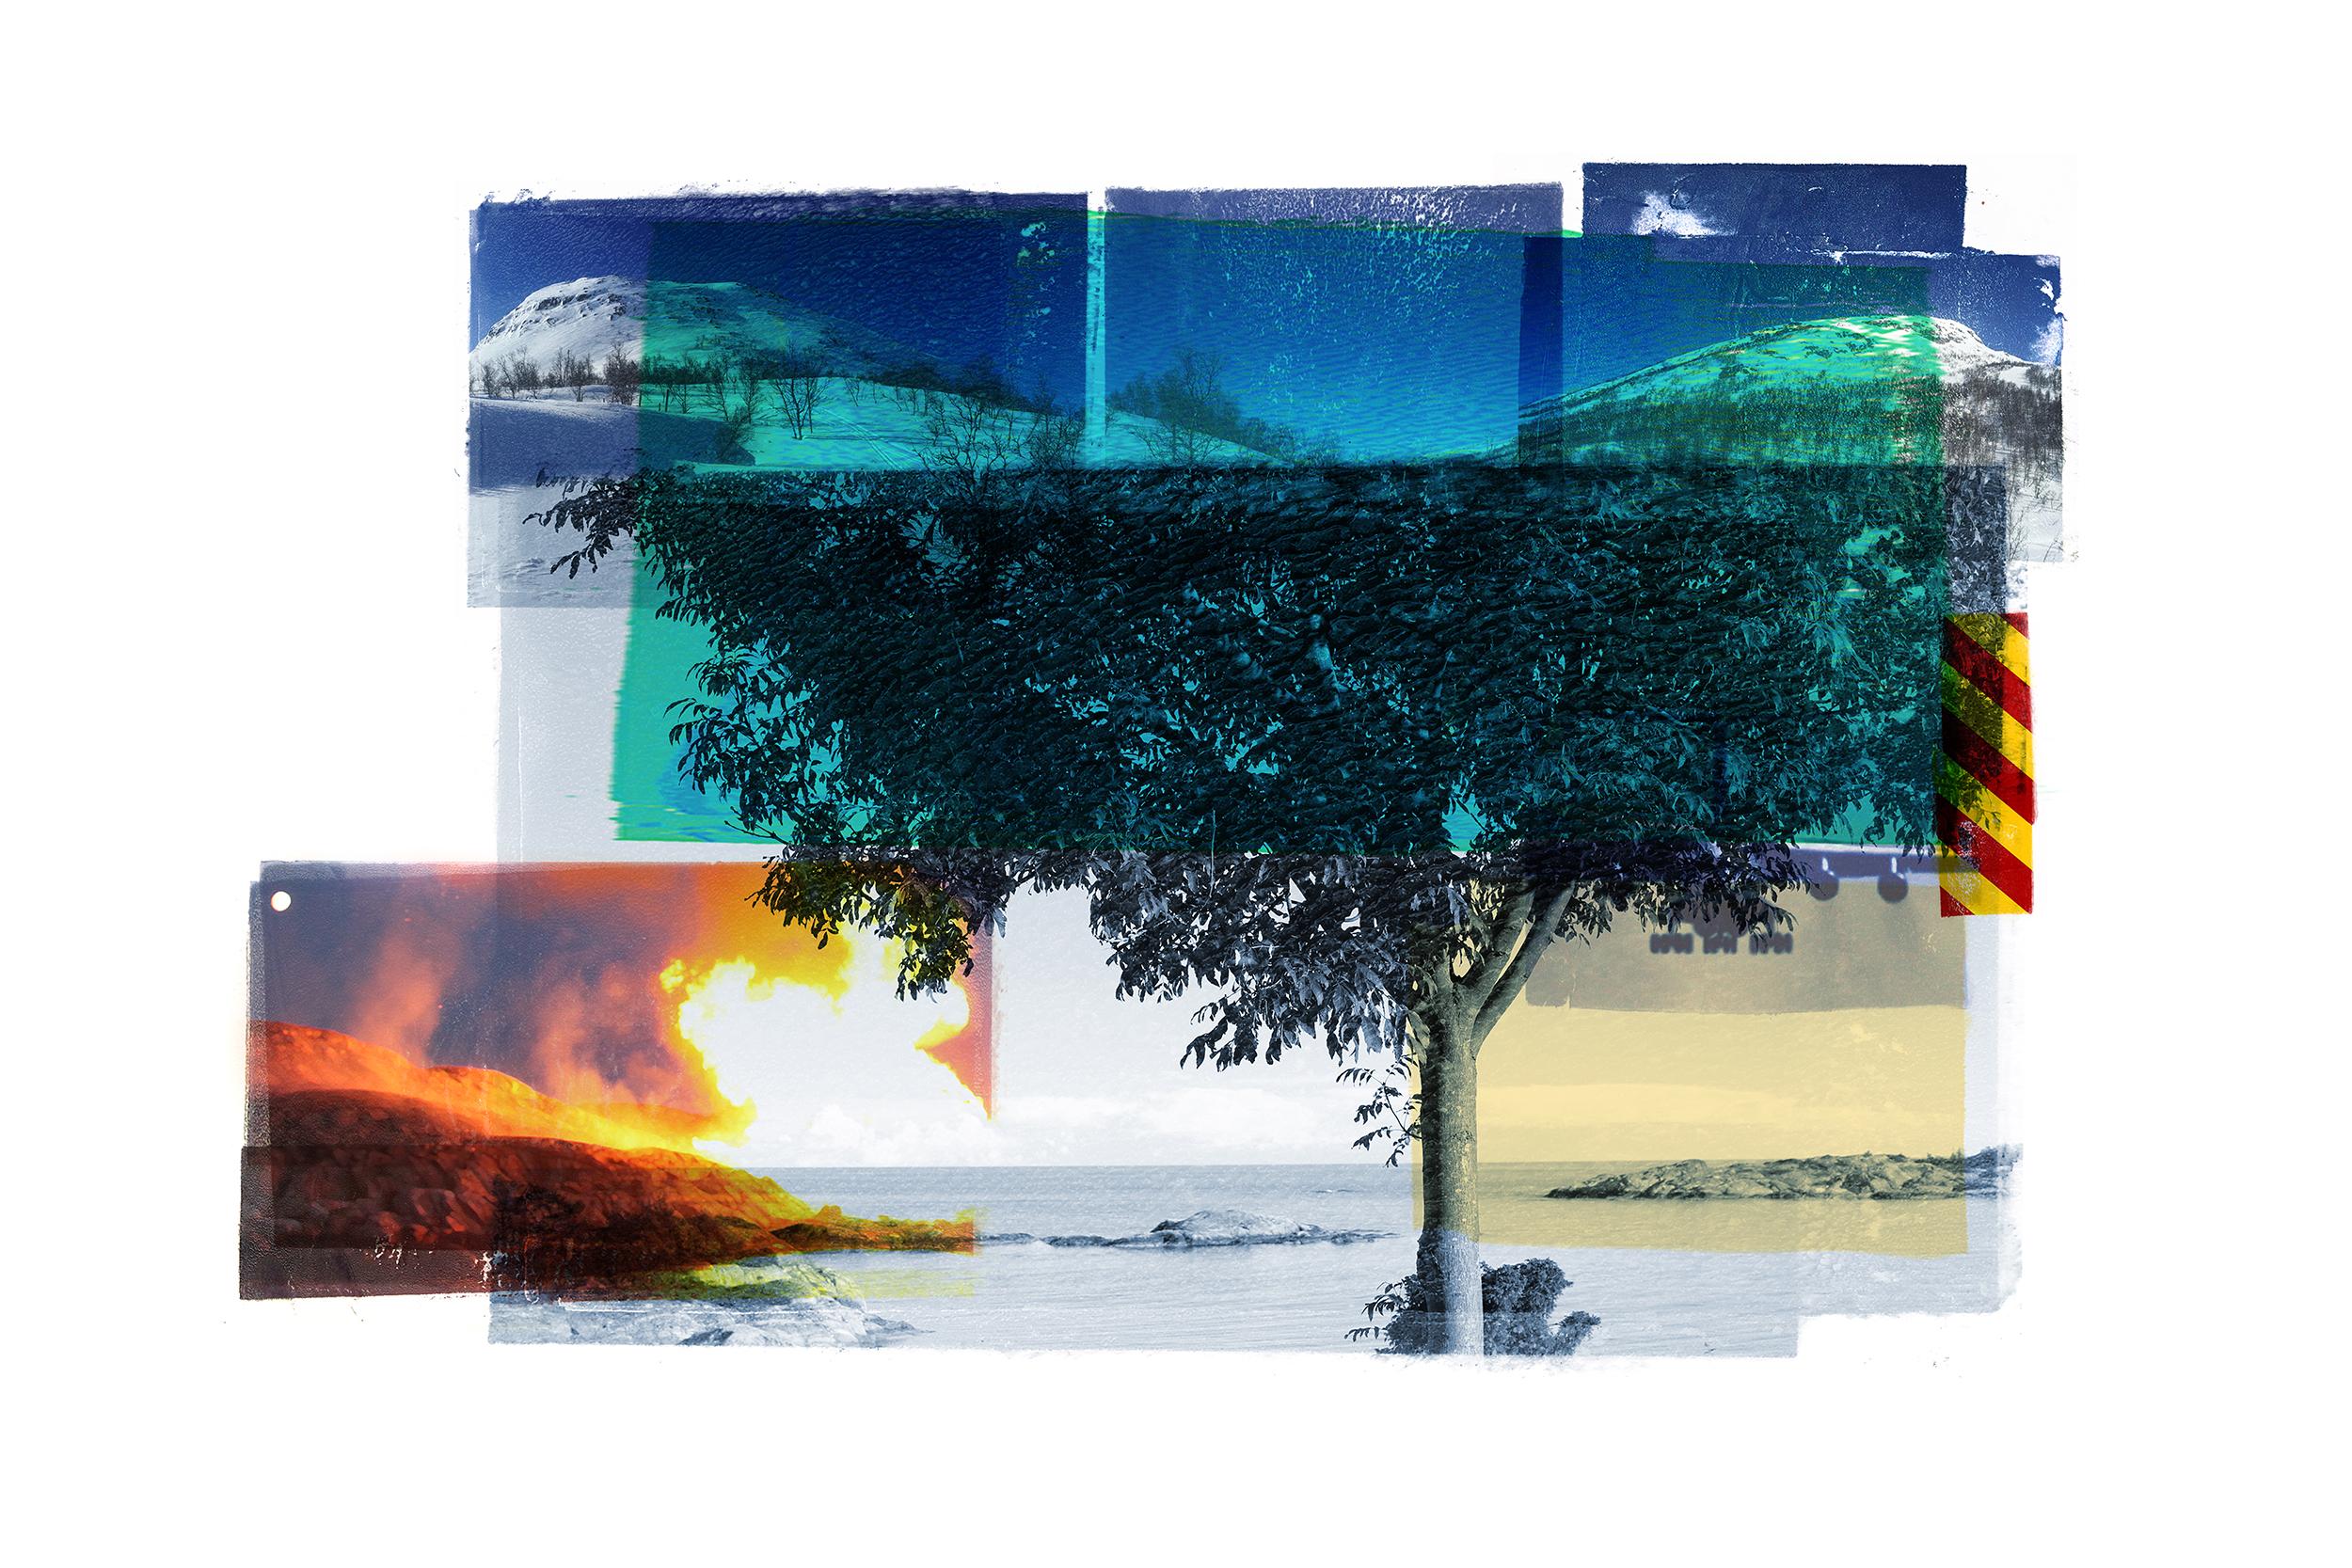 Reservoir / Blue Tree / Ritual (Breive)  Original Archival UV Pigment Print / BFK Rives 300 gr 120 x 80 cm / 47 x 32 in Edition of 50 + 5 Ap Editeur: Per Fronth Studios / Printer Henrik Aunevik  01/ 2016: